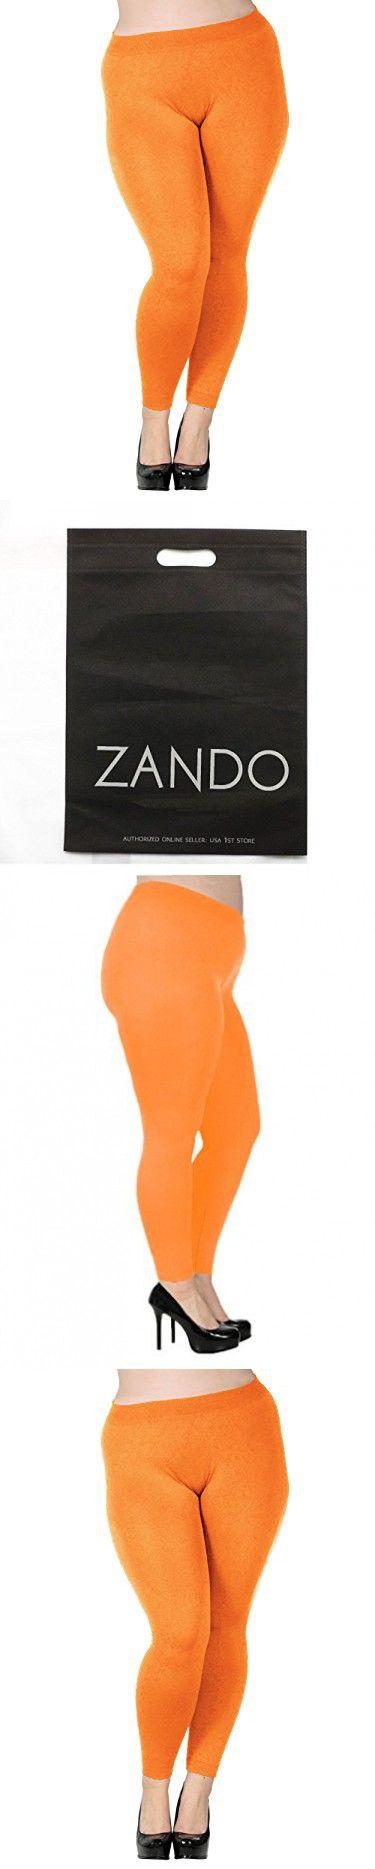 Zando Women's Plus Size Basic Leggings Stretch Lightweight Full Length Yoga Pants H Orange US 3X Plus